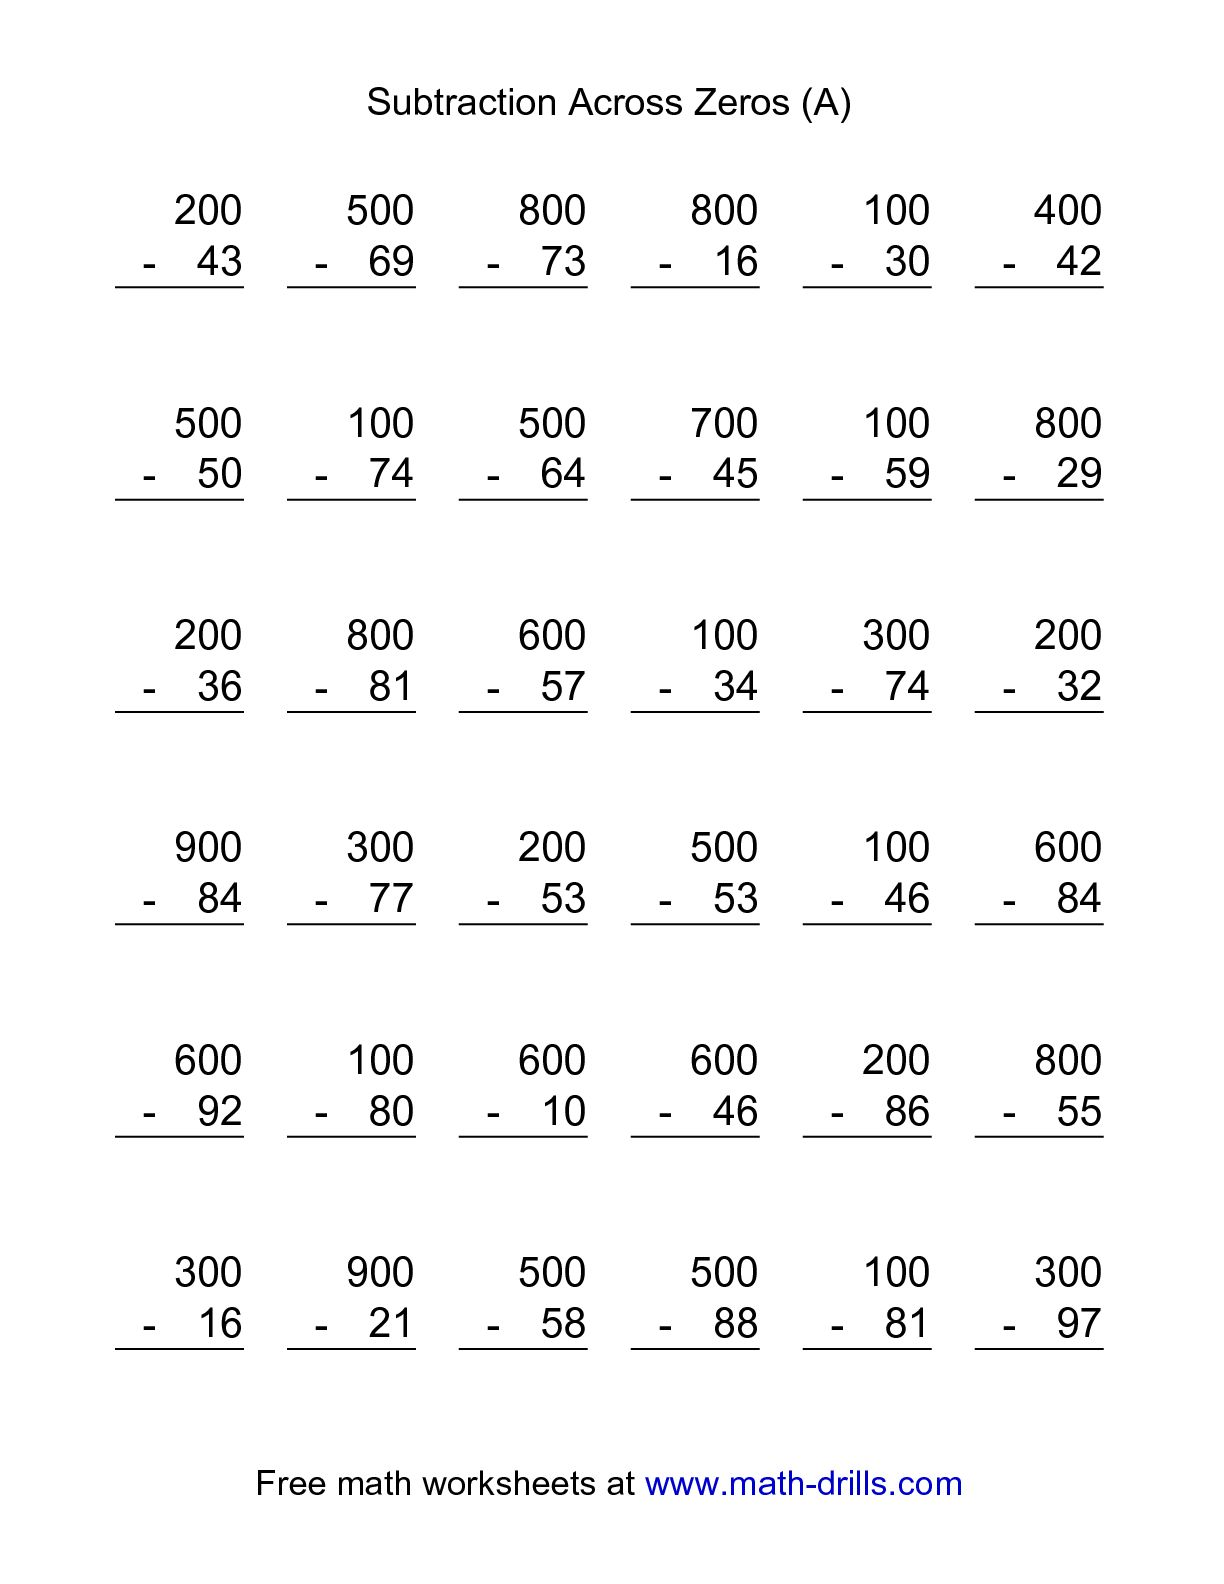 Subtracting Across Zeros Worksheets 3rd Grade Free Worksheet